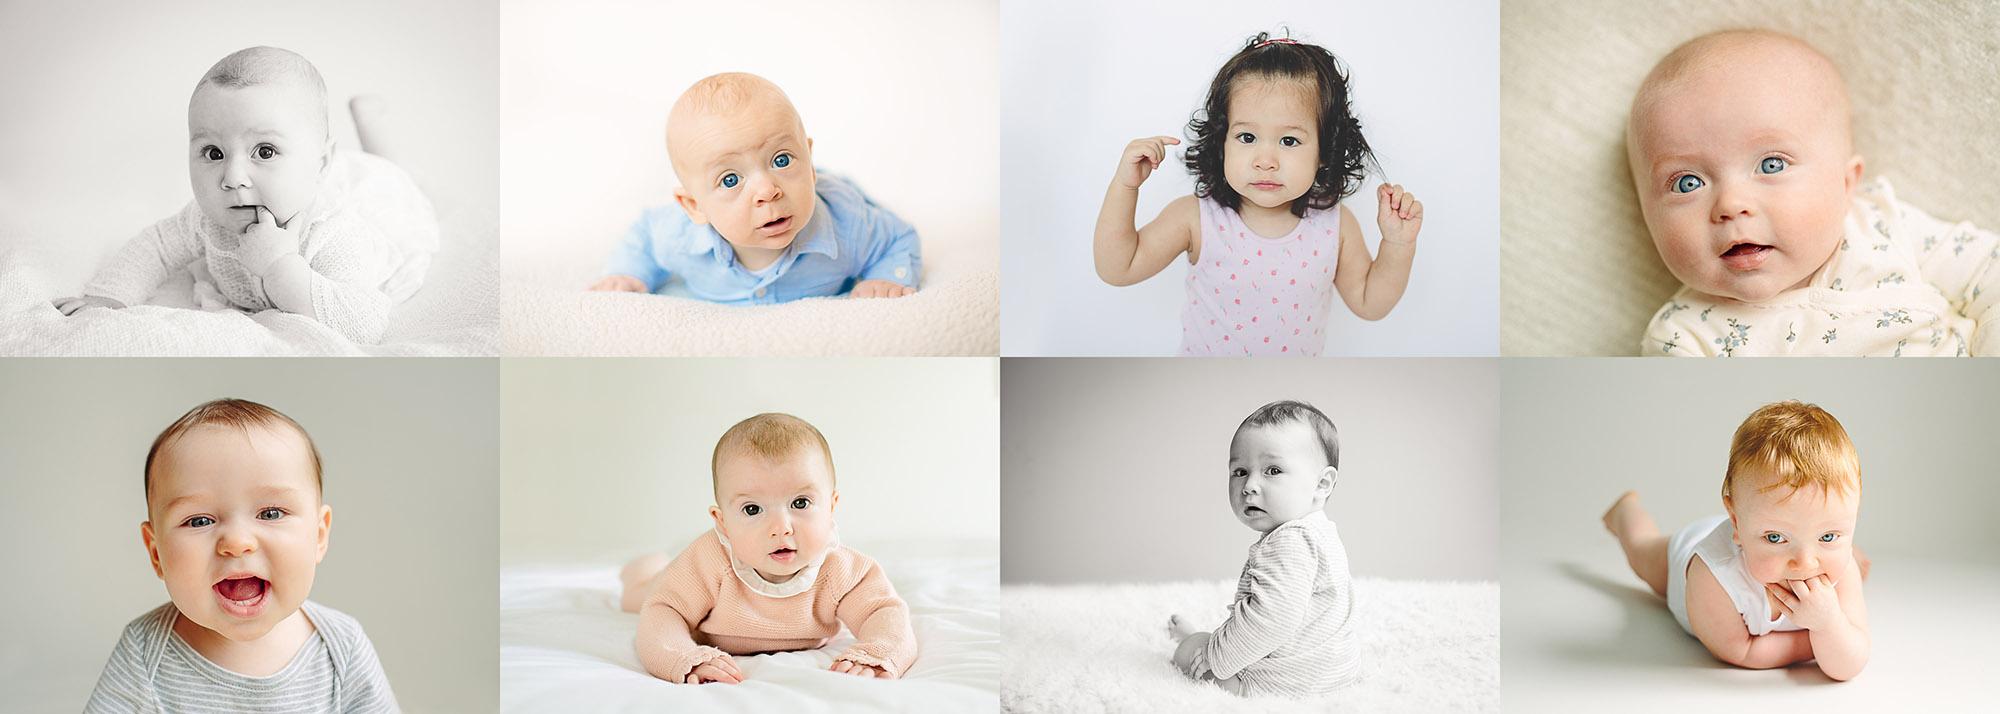 baby phtography dublin